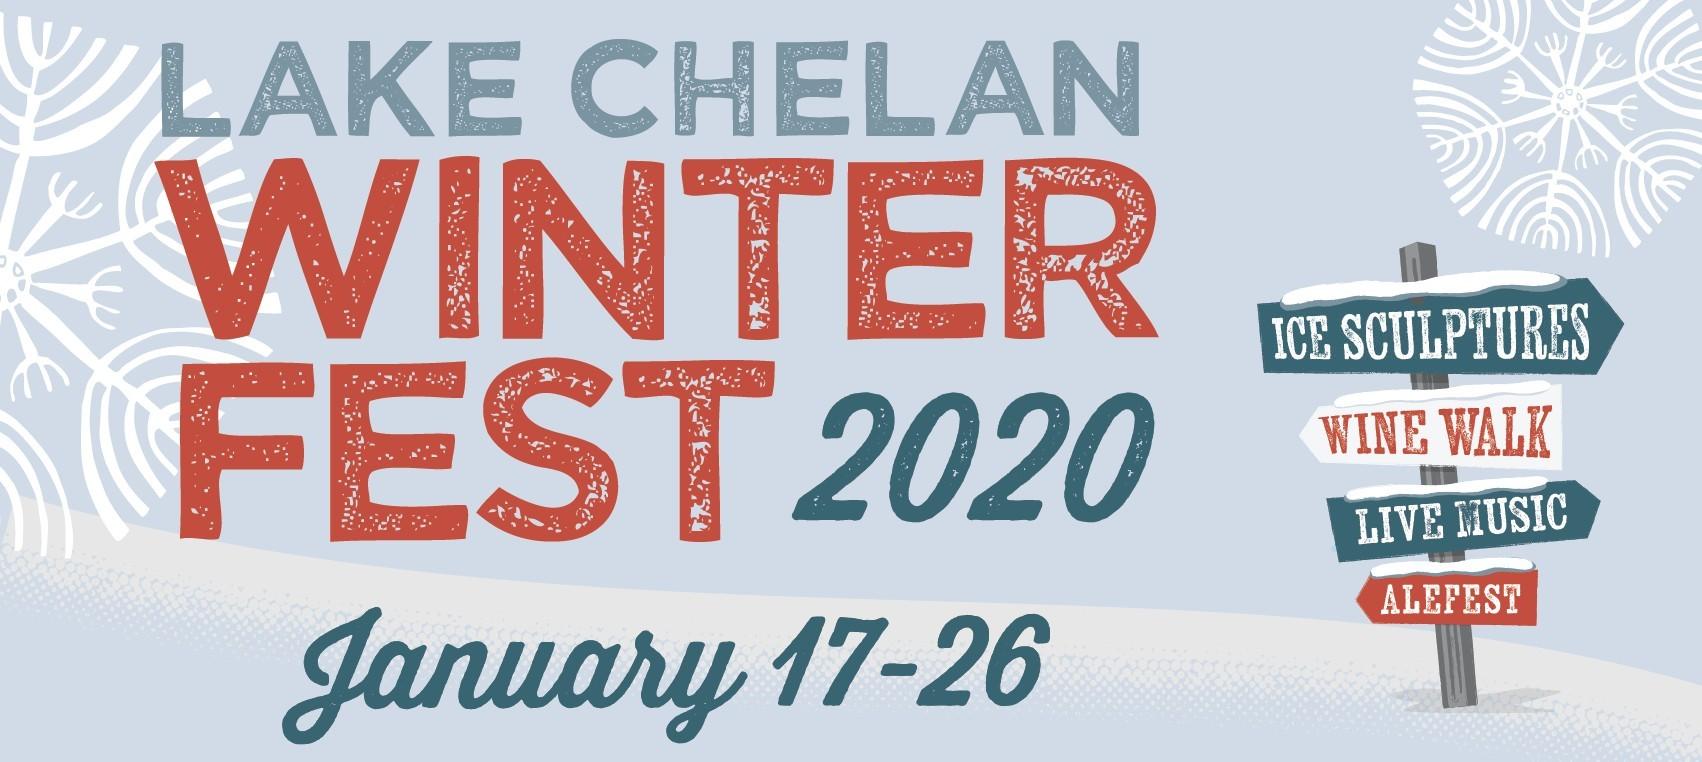 lake chelan winter fest 2020 poster - Winterfest